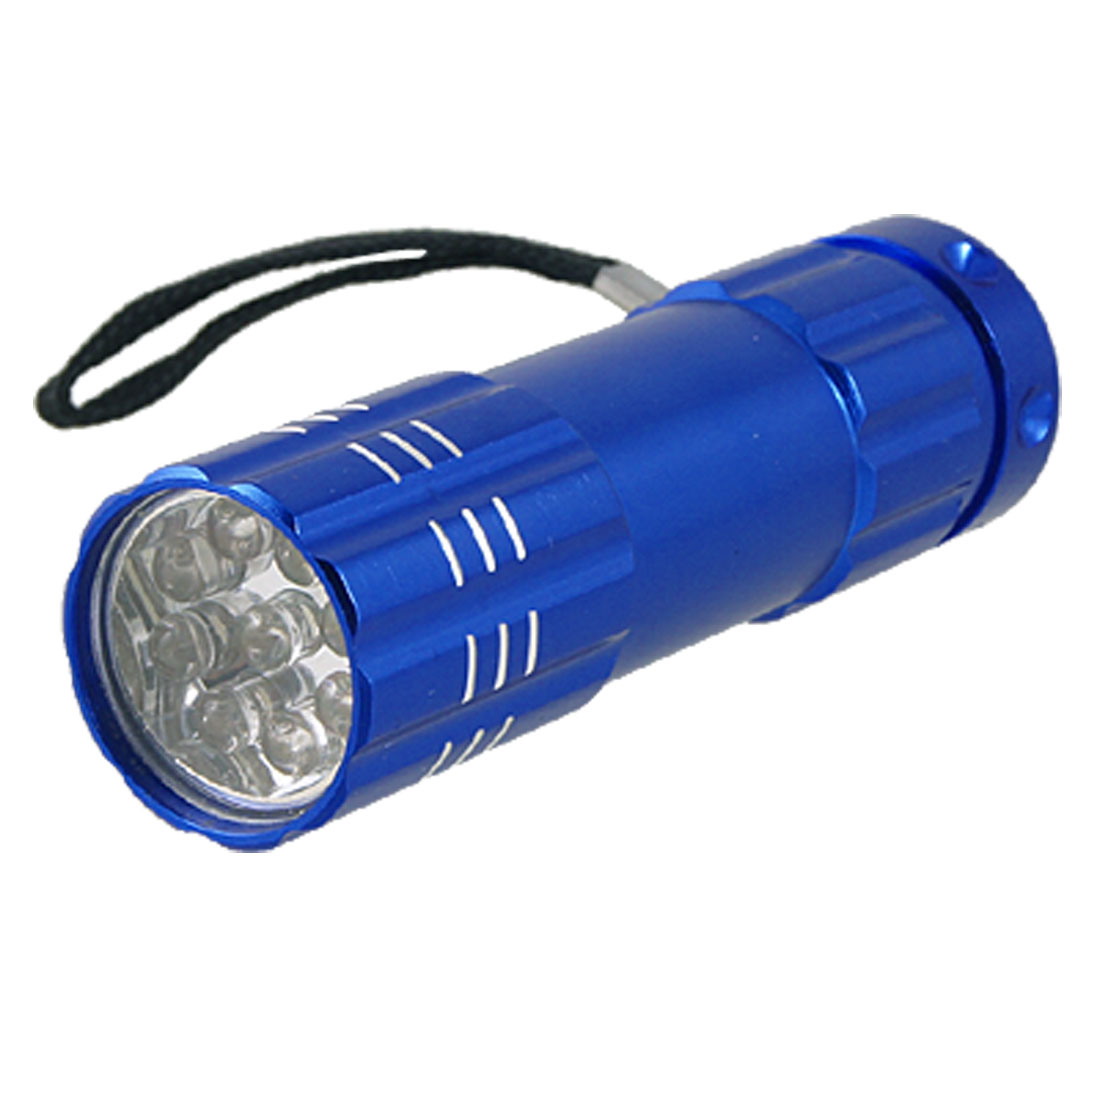 Camping Royal Blue Shell 9 LEDs White Light Flashlight